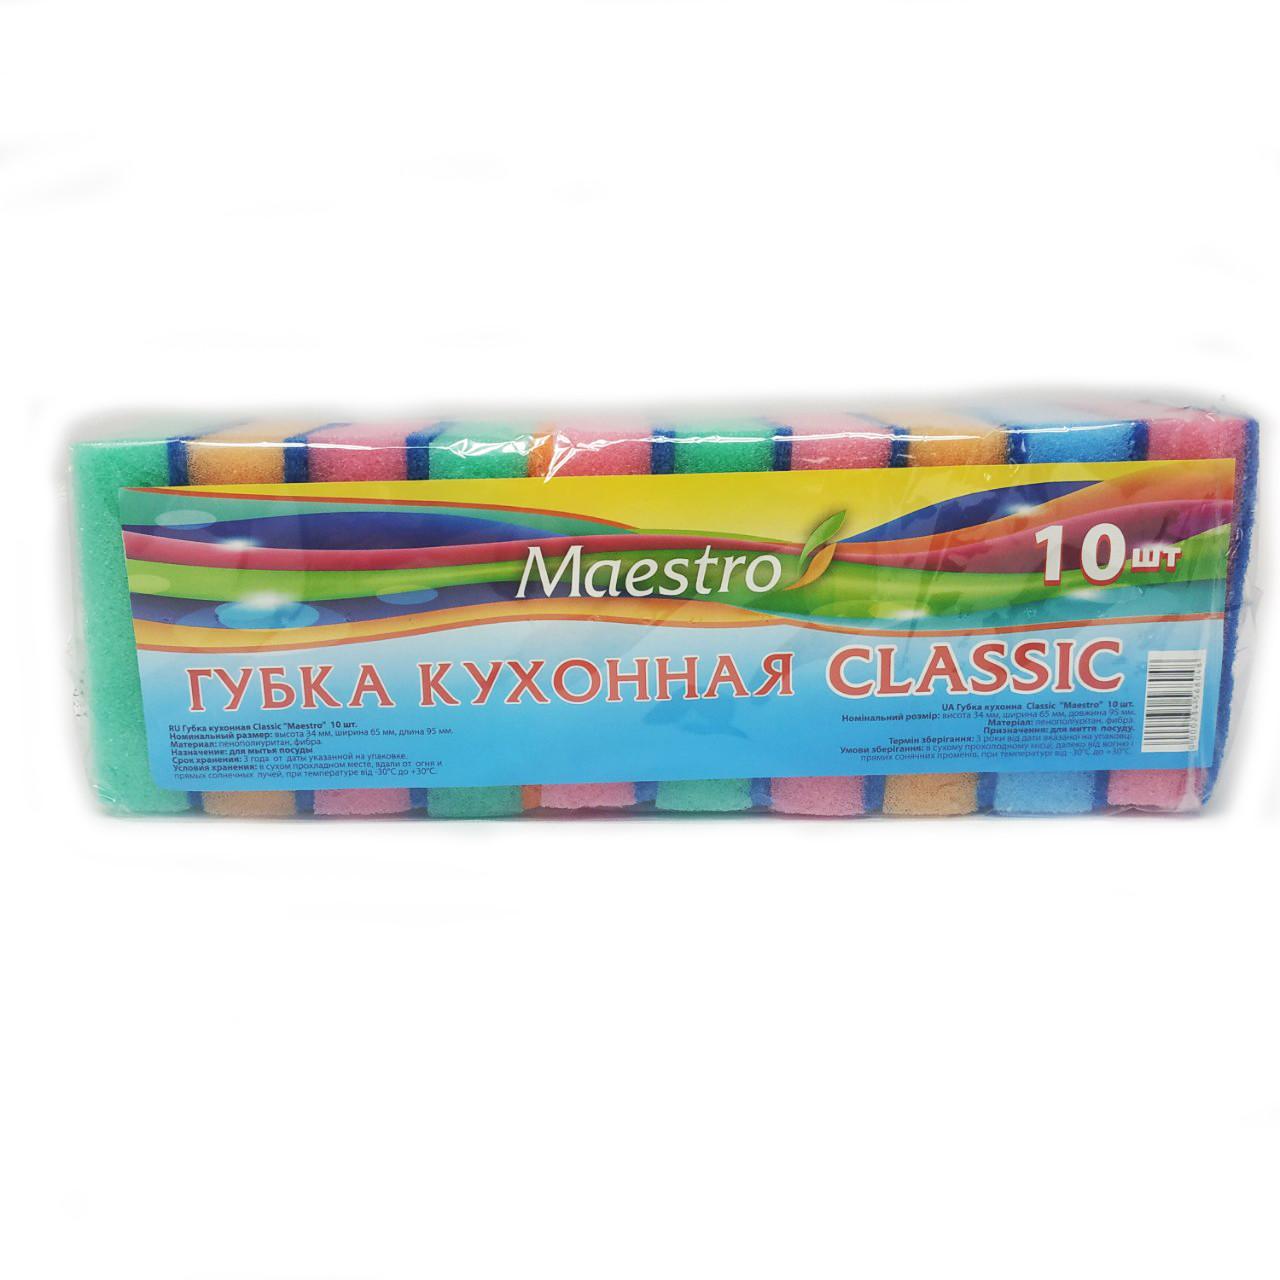 Губки кухонные Maestro Classic, упаковка — 10 шт